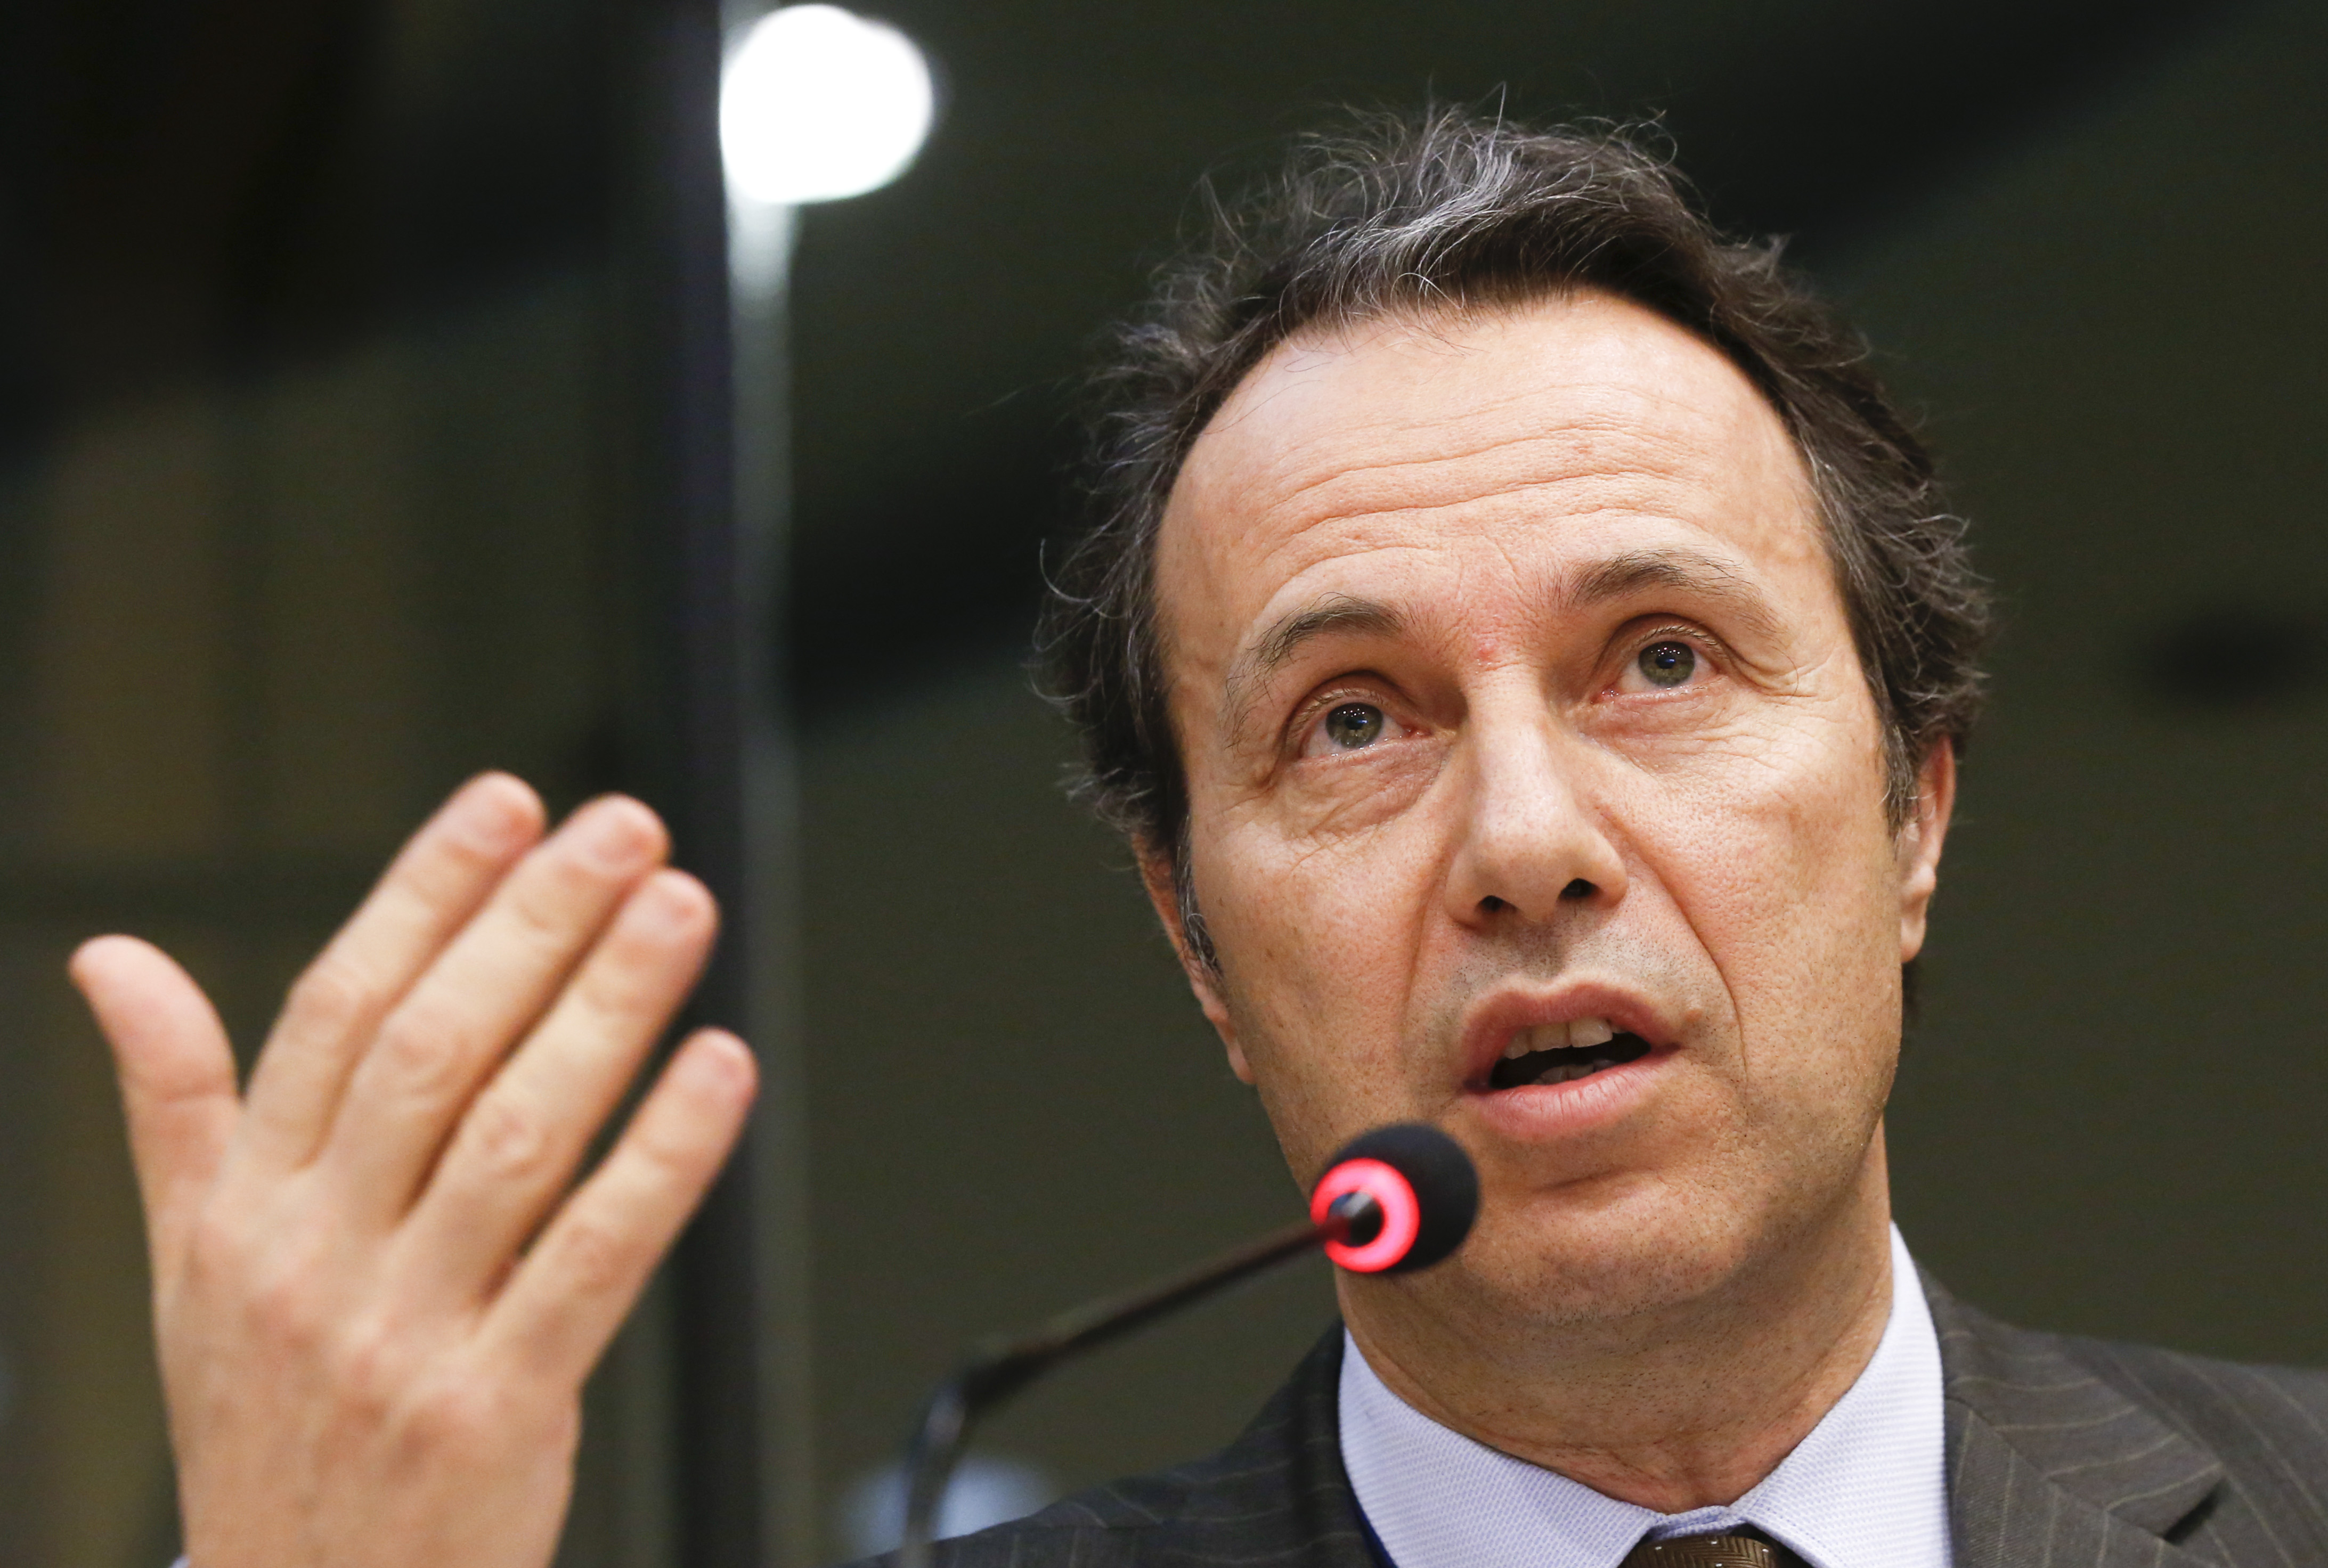 Arnaldo Abruzzini, Secretary-General of Eurochambres